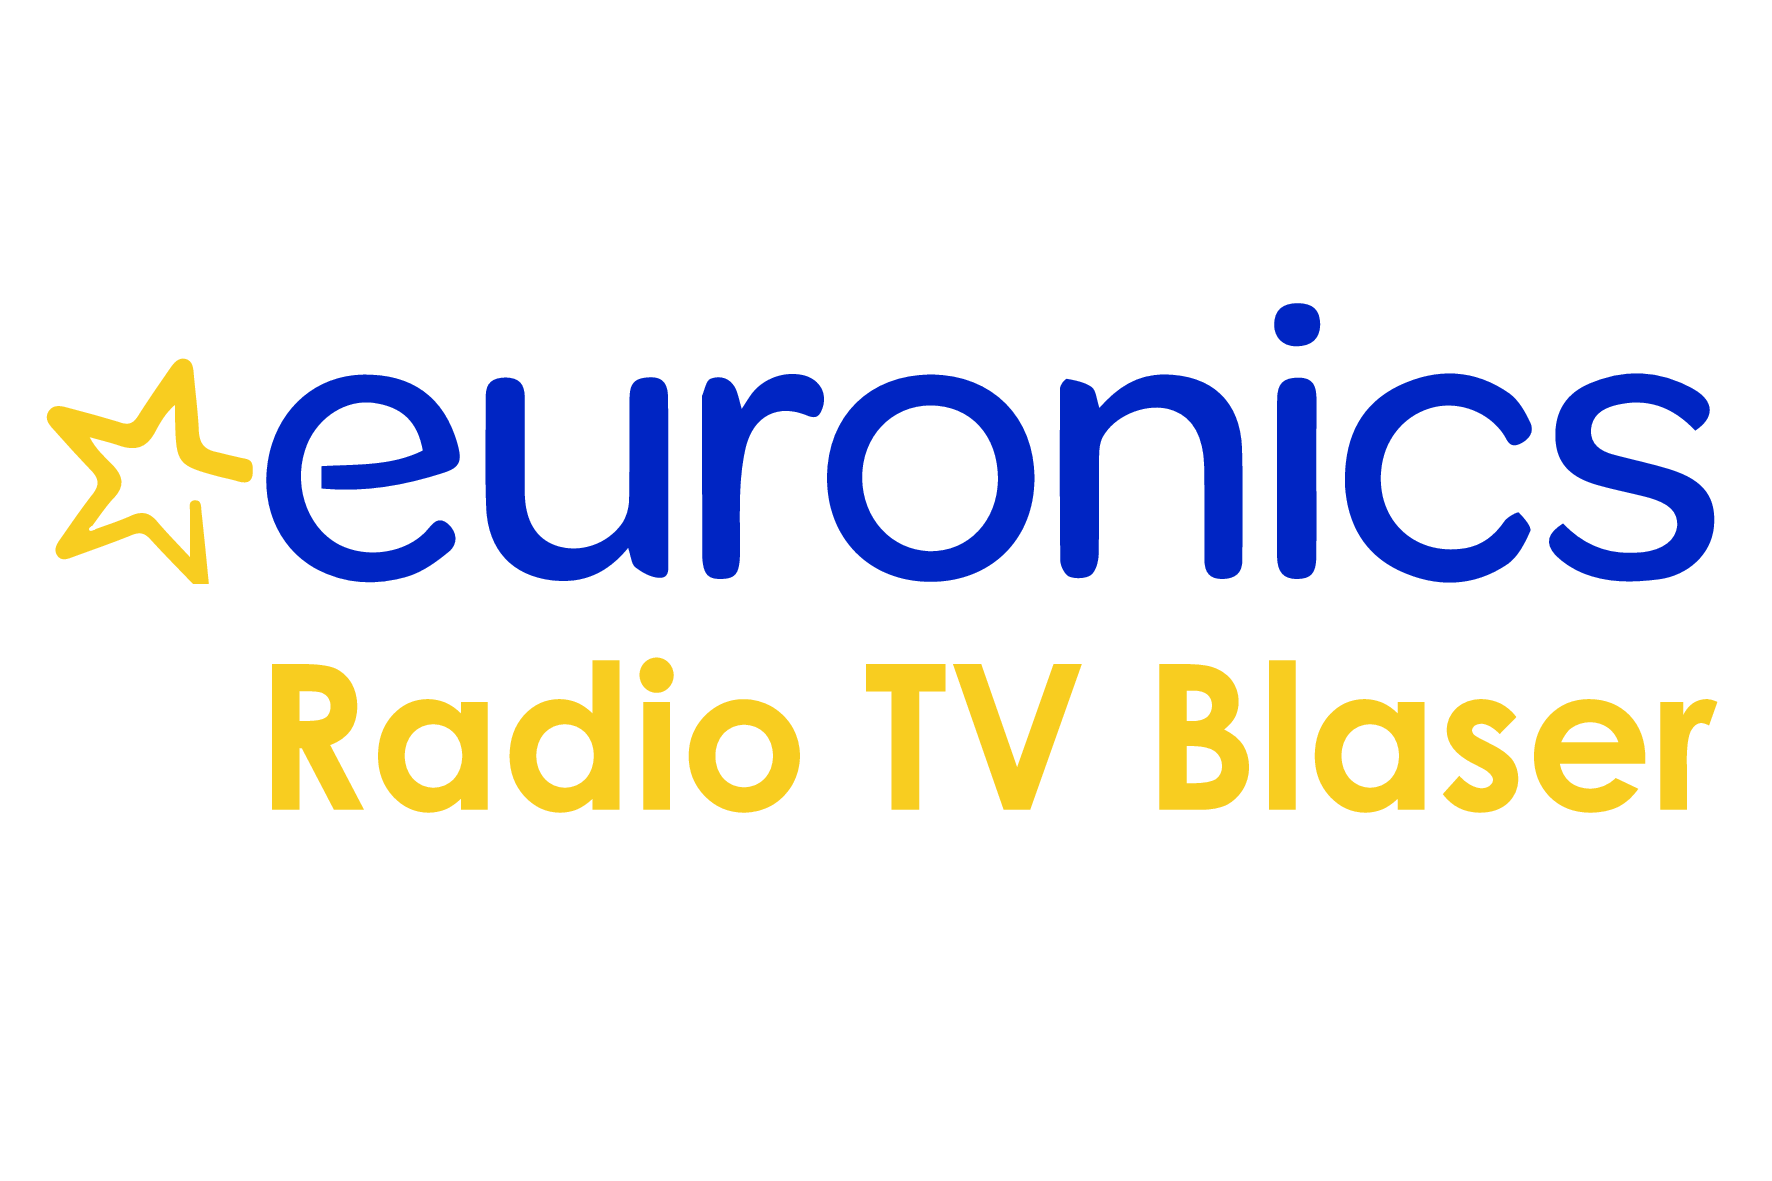 Radio Blaser TV